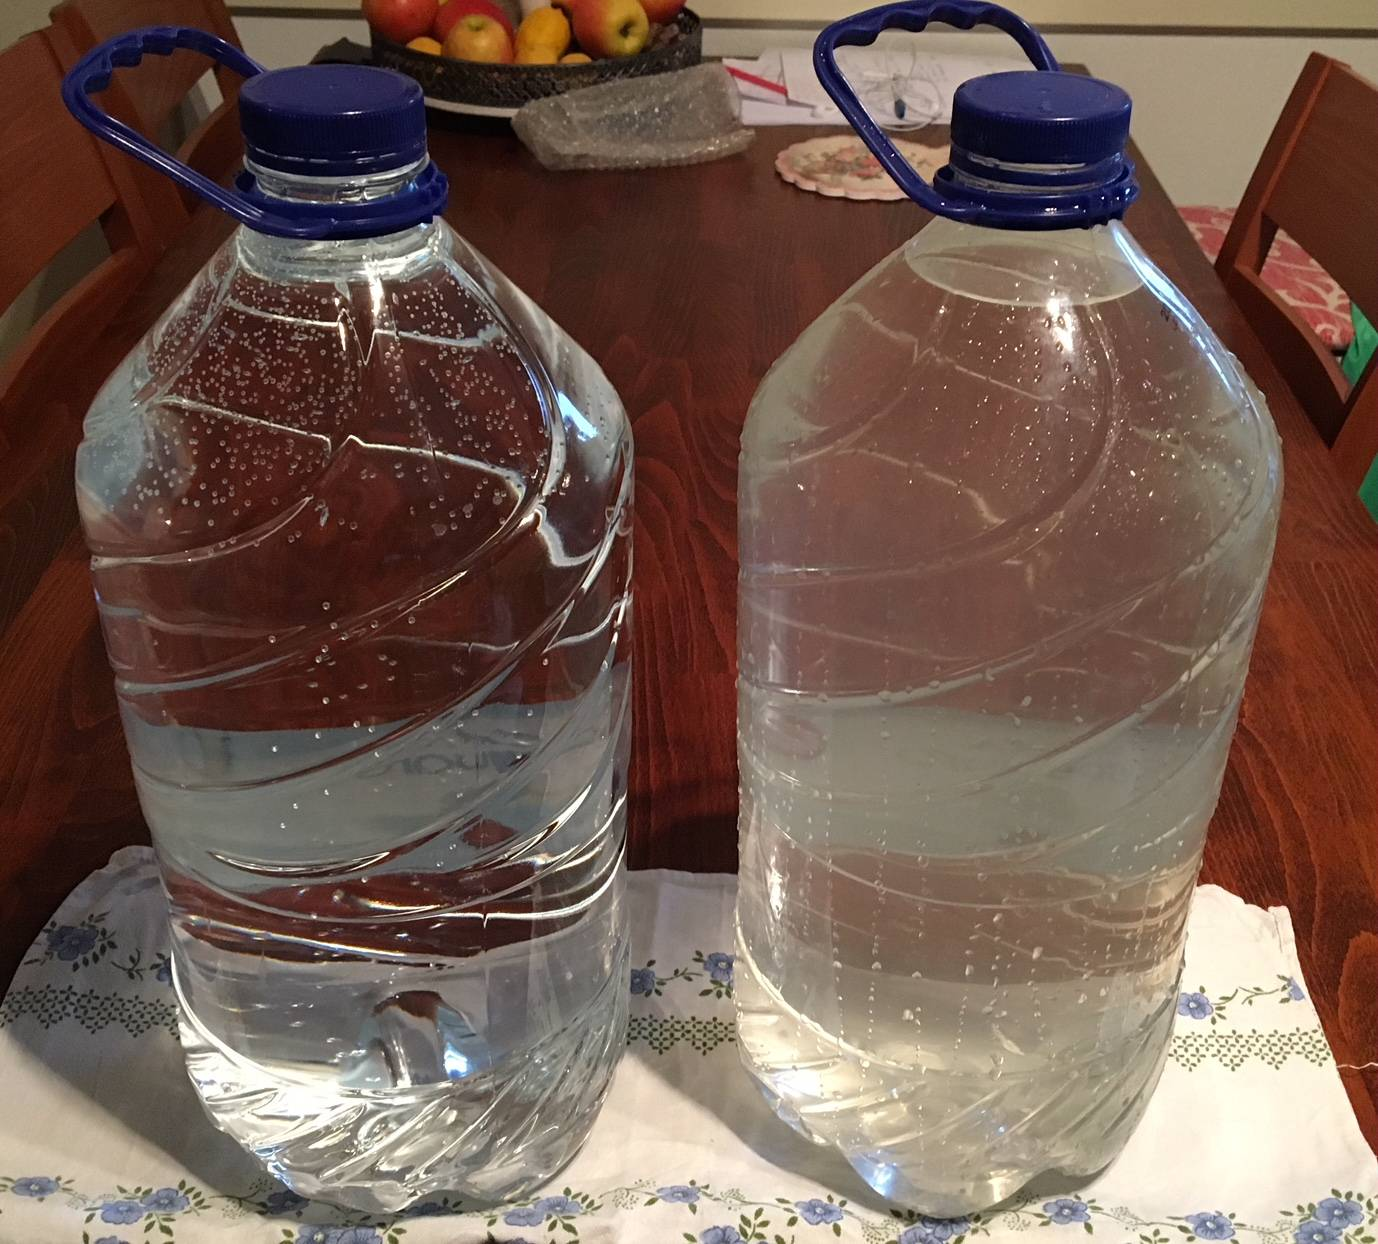 Splitski vodovod: 'Vodu više ne treba kuhati prije konzumacije'